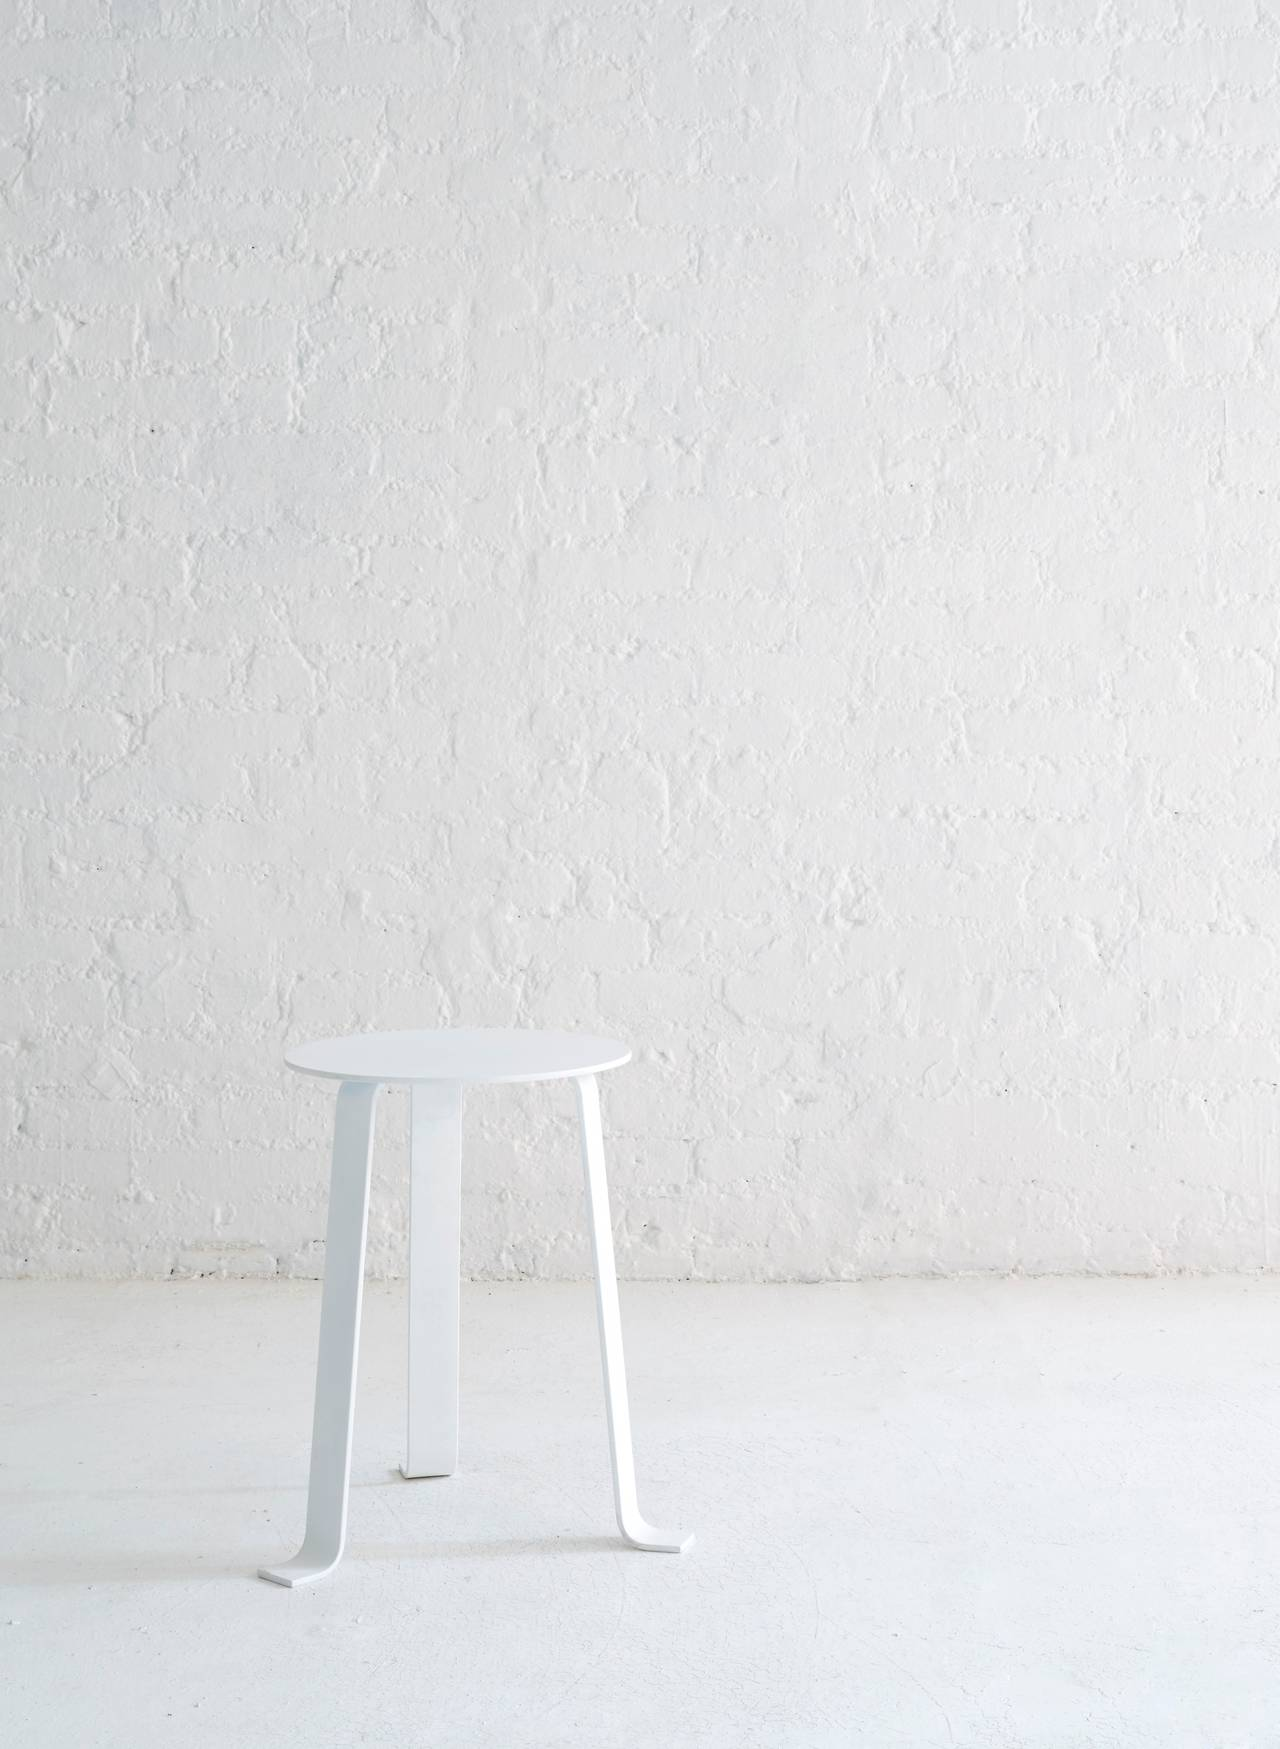 Minimalist Steel Tripod Stool For Sale